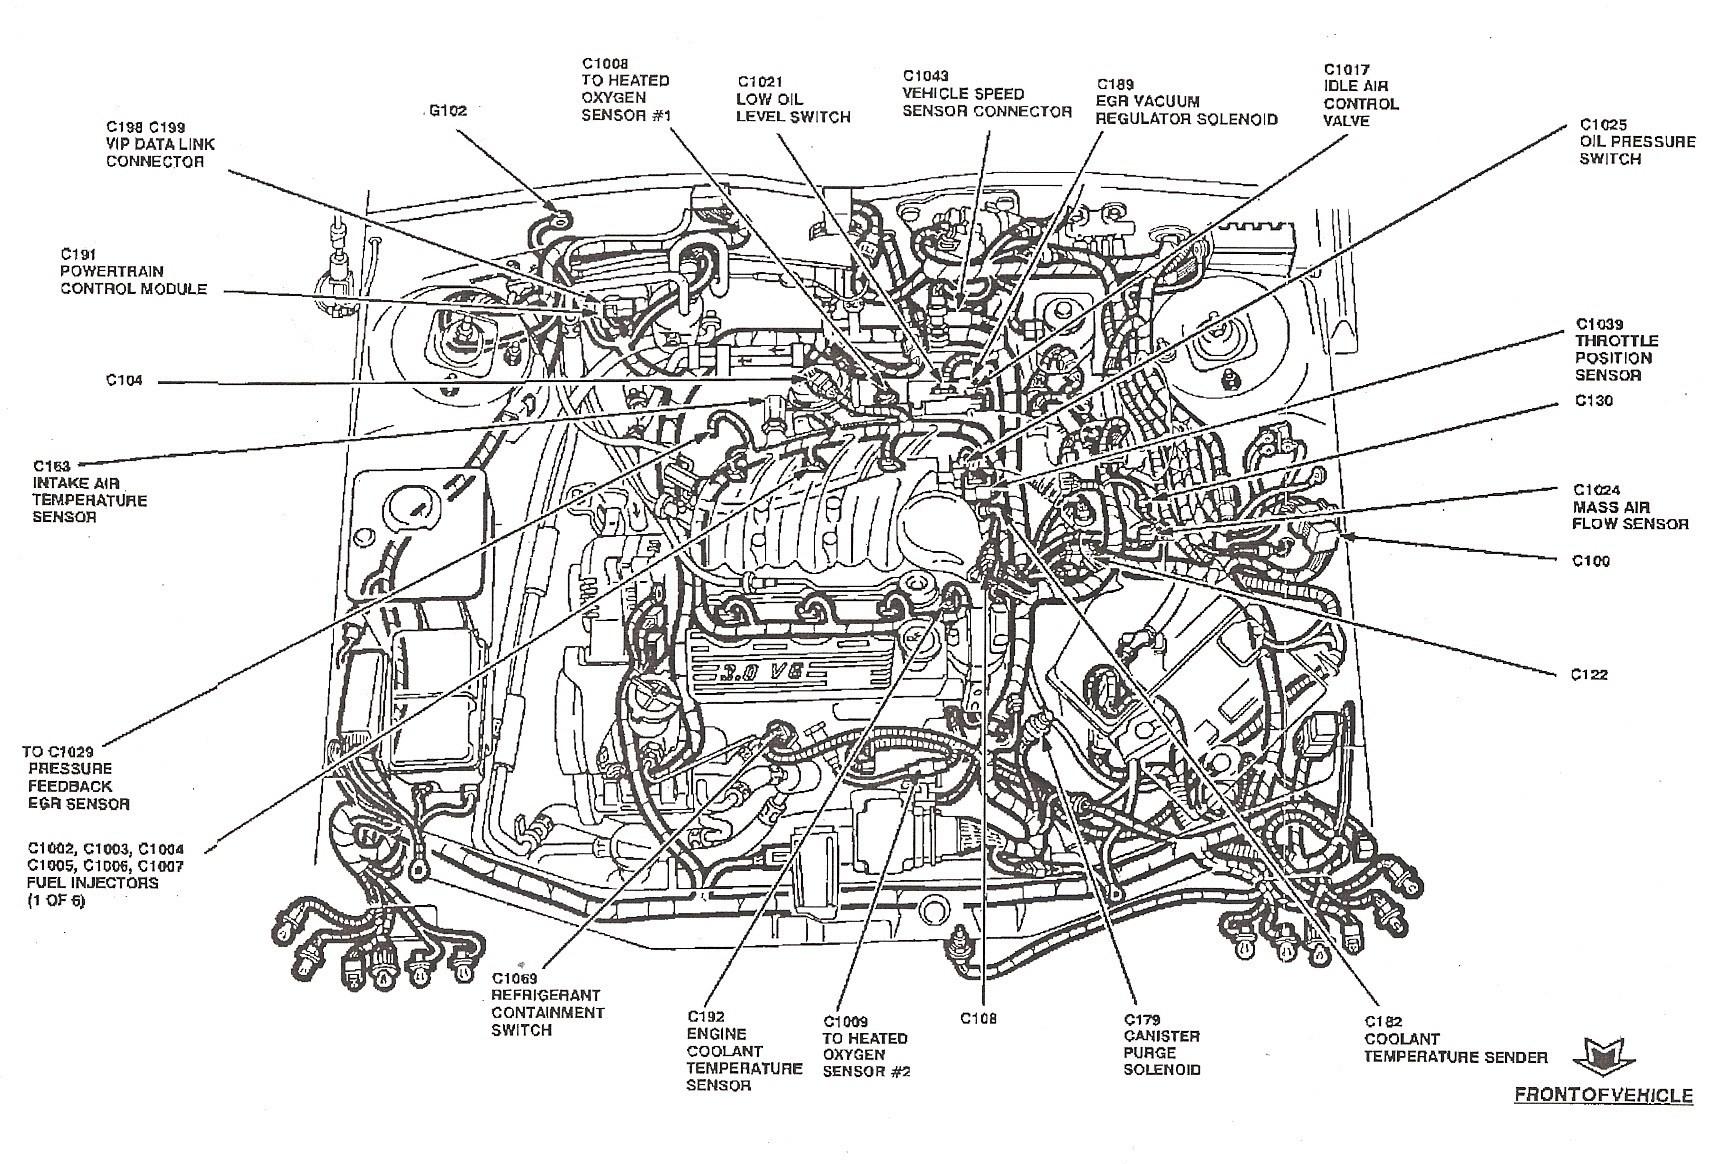 2001 ford Windstar Engine Diagram Fuel Line Diagram ford Taurus Fuel Line Diagram ford F150 Fuel Of 2001 ford Windstar Engine Diagram